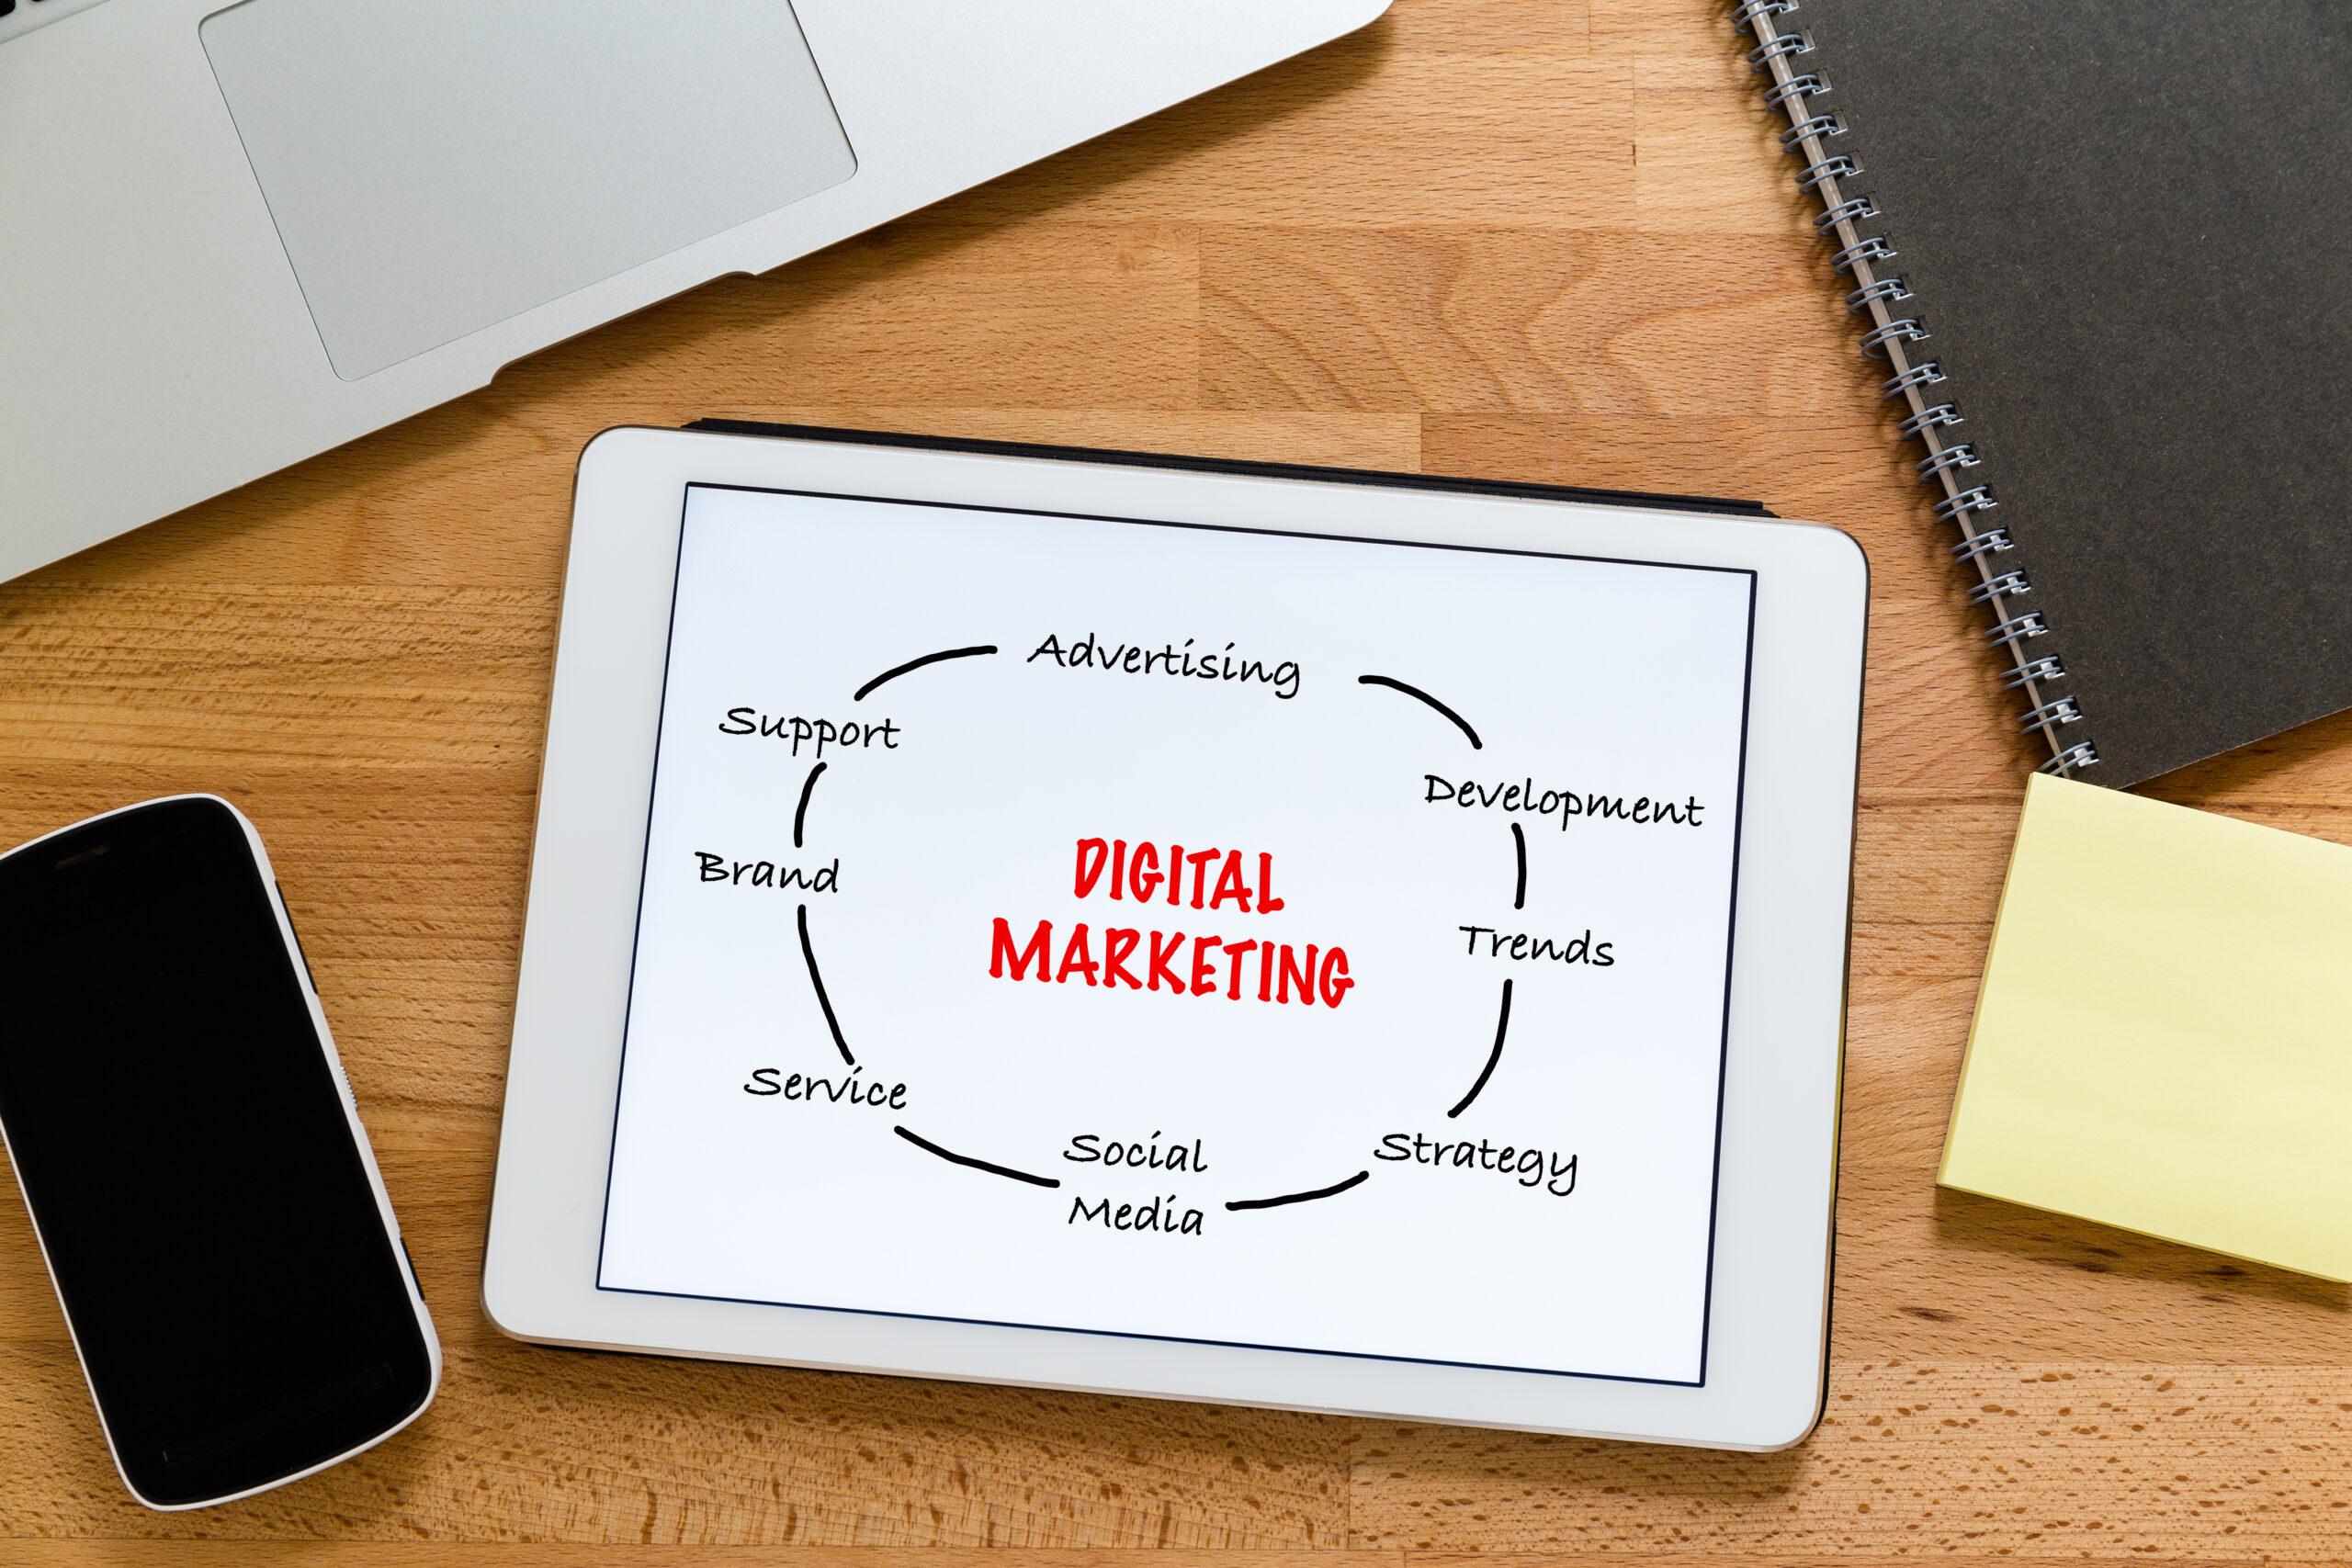 Digital Business Marketing Plan